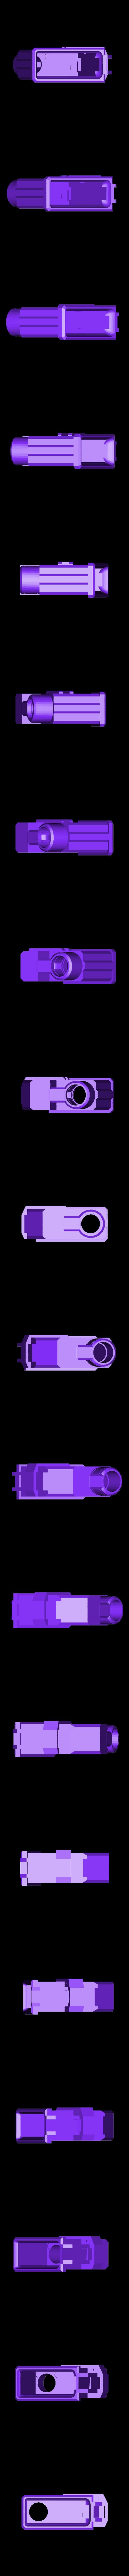 T15_magwell_PUMP_M1.stl Download free STL file T15 Mag Adapter Maverick, Trracer pump paintball • 3D printer design, UntangleART